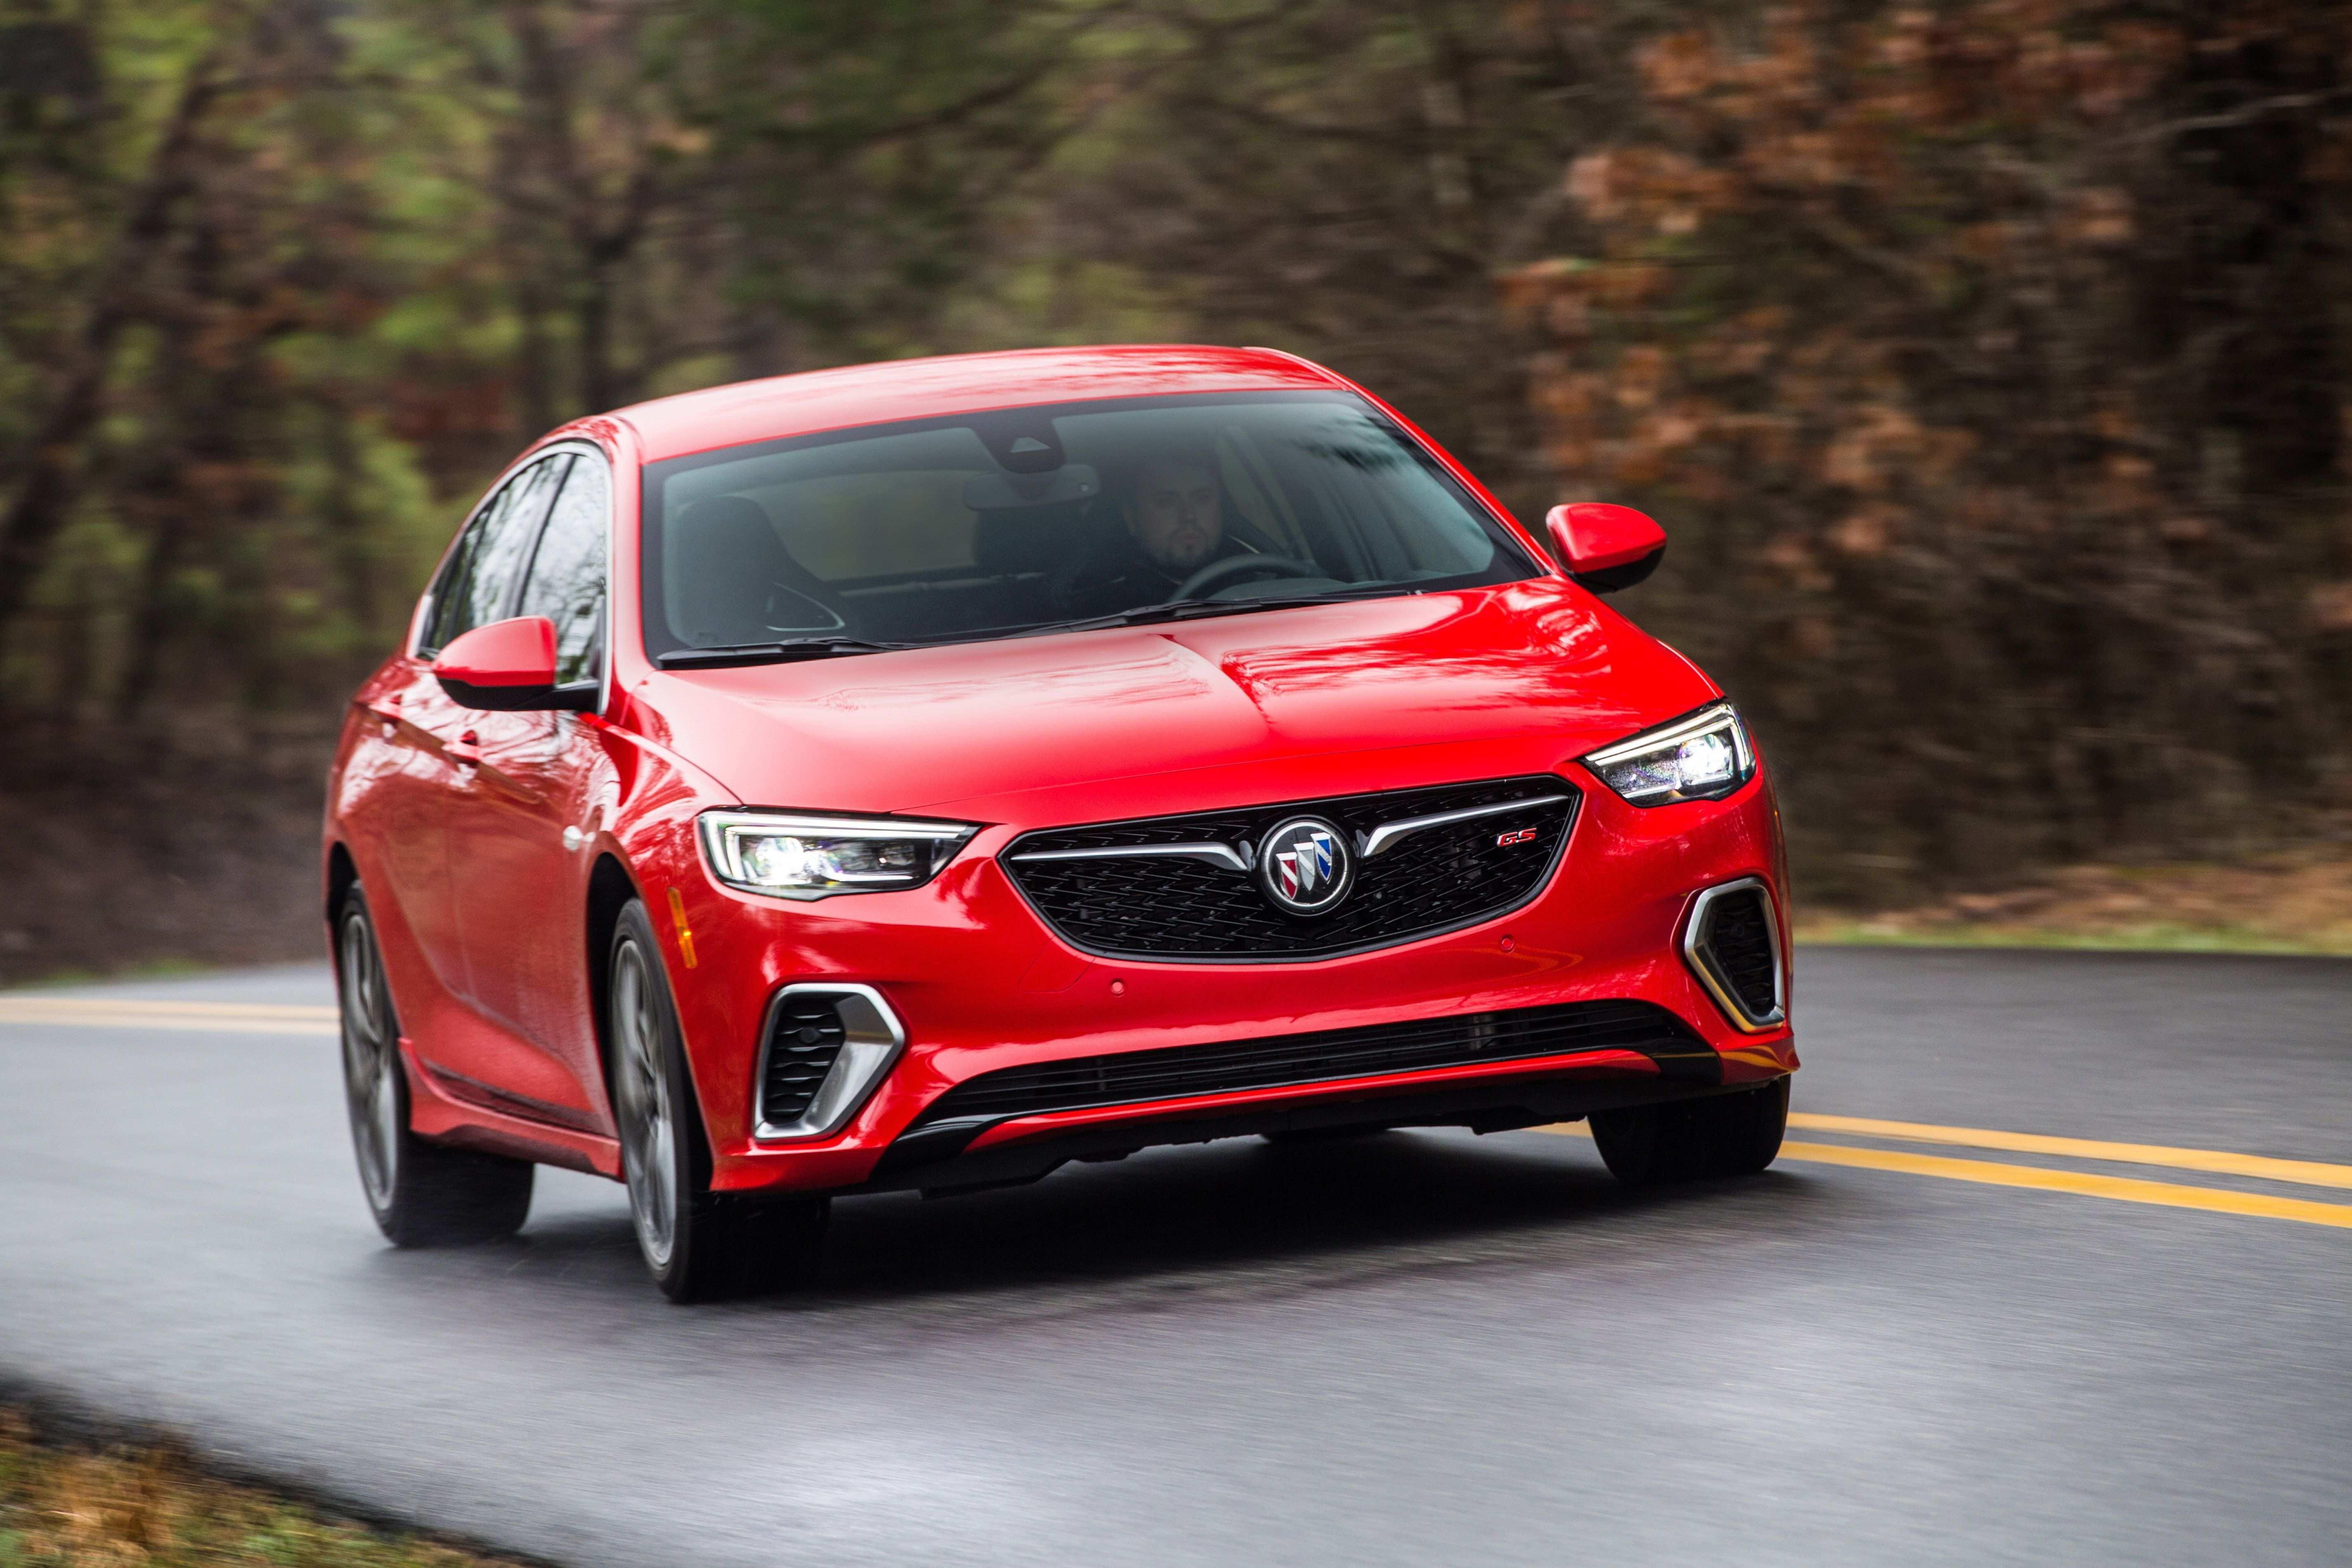 45 New Mazda 2019 Lanzamiento Exterior And Interior Review History by Mazda 2019 Lanzamiento Exterior And Interior Review